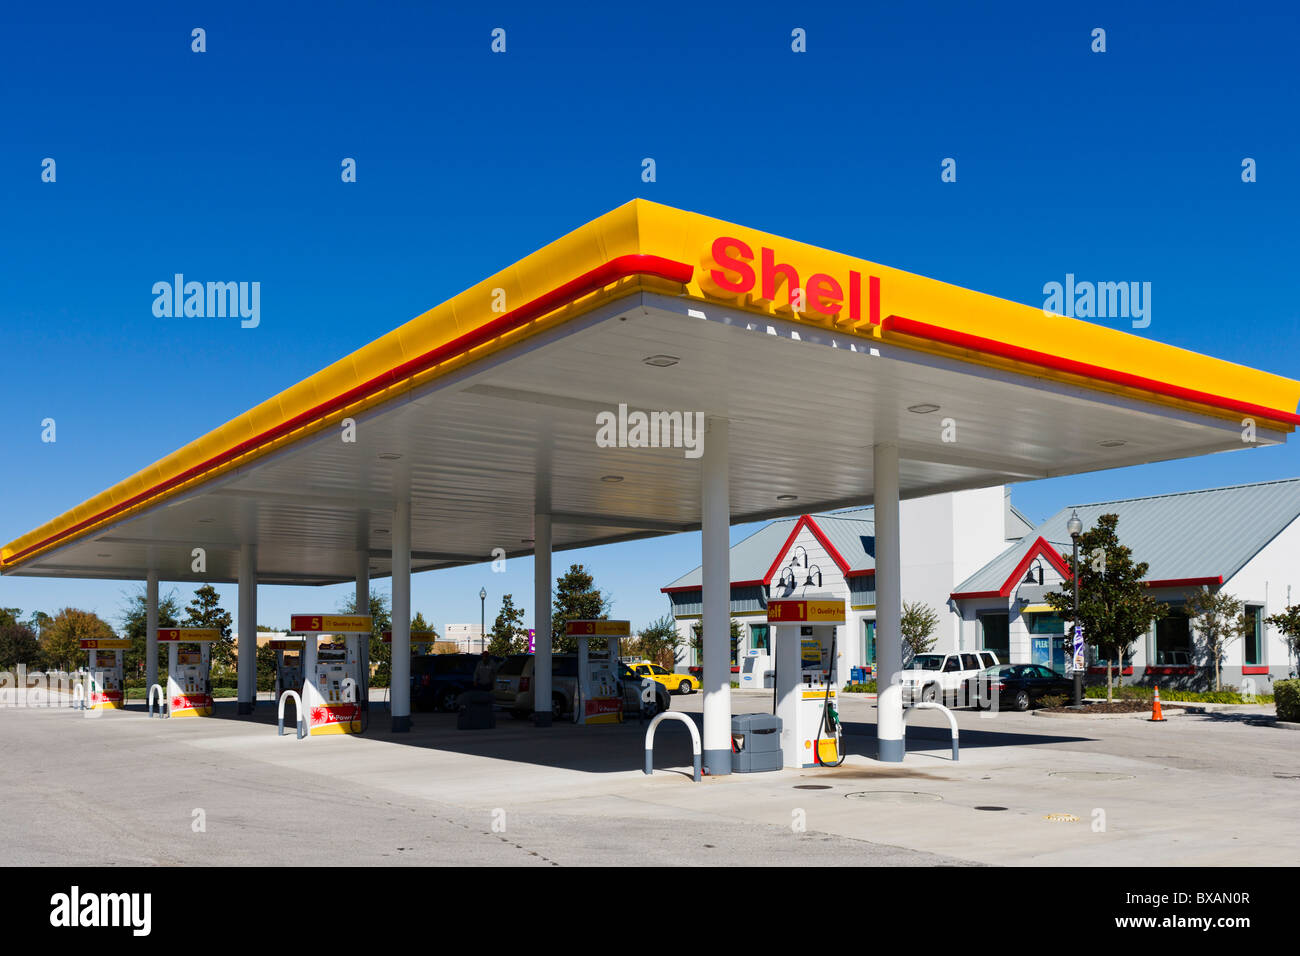 La gasolinera de Shell, Haines City, Florida, EE.UU. Imagen De Stock